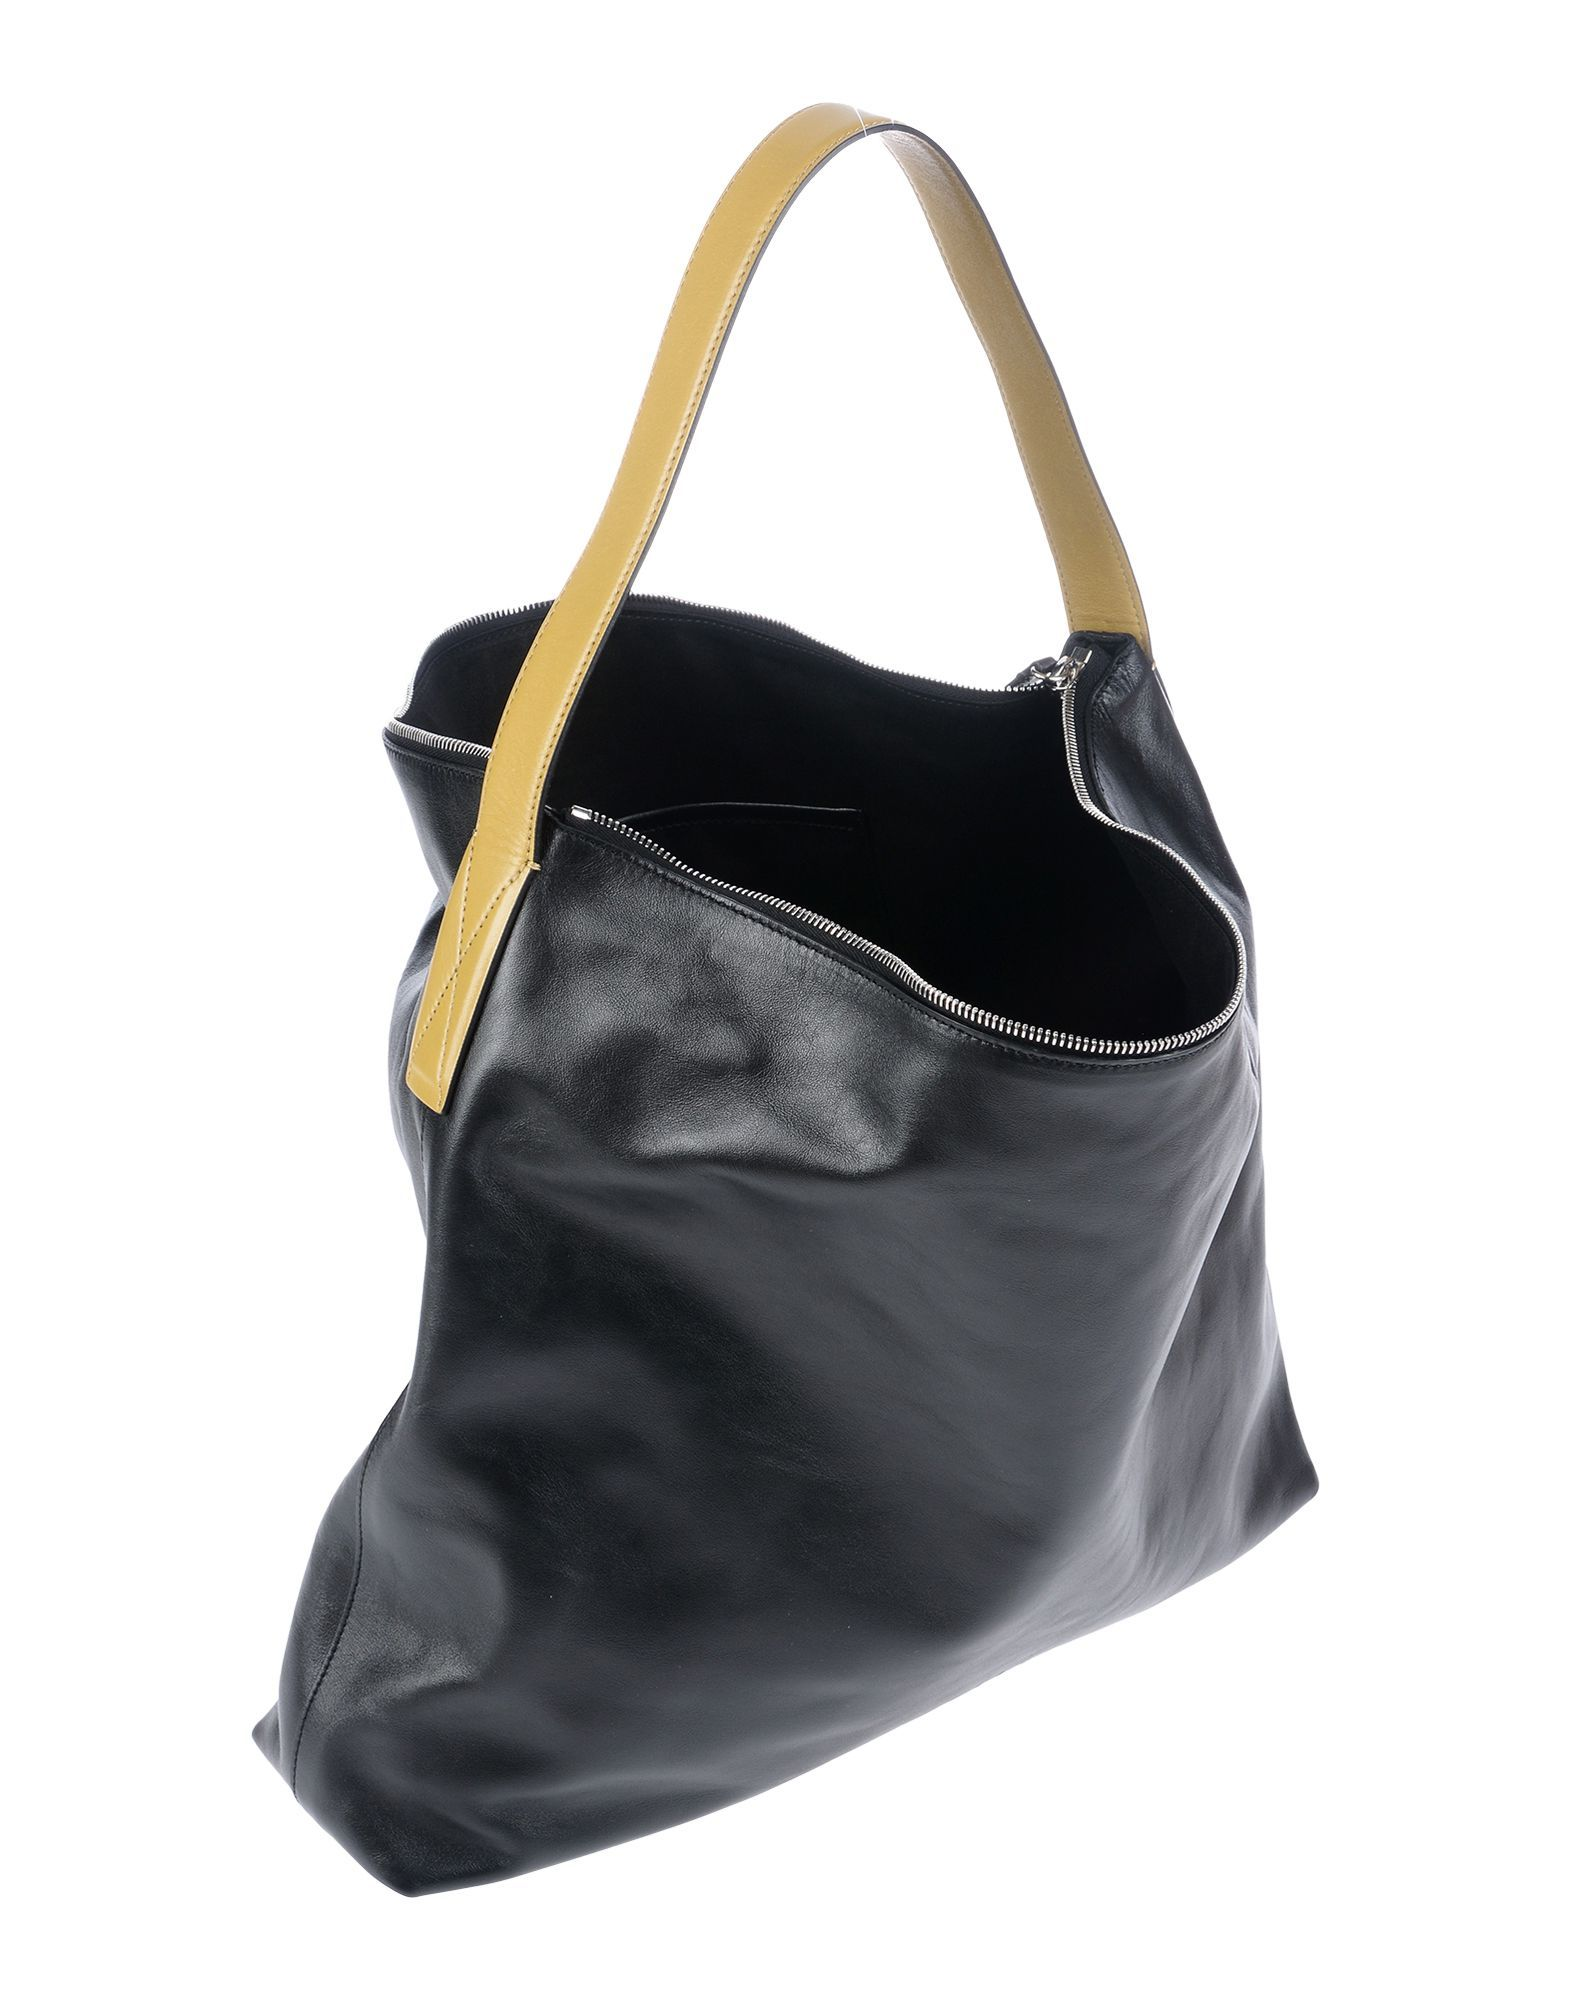 642941e3247d Marni Handbag - Women Marni Handbags online on YOOX United Kingdom -  45430977OH